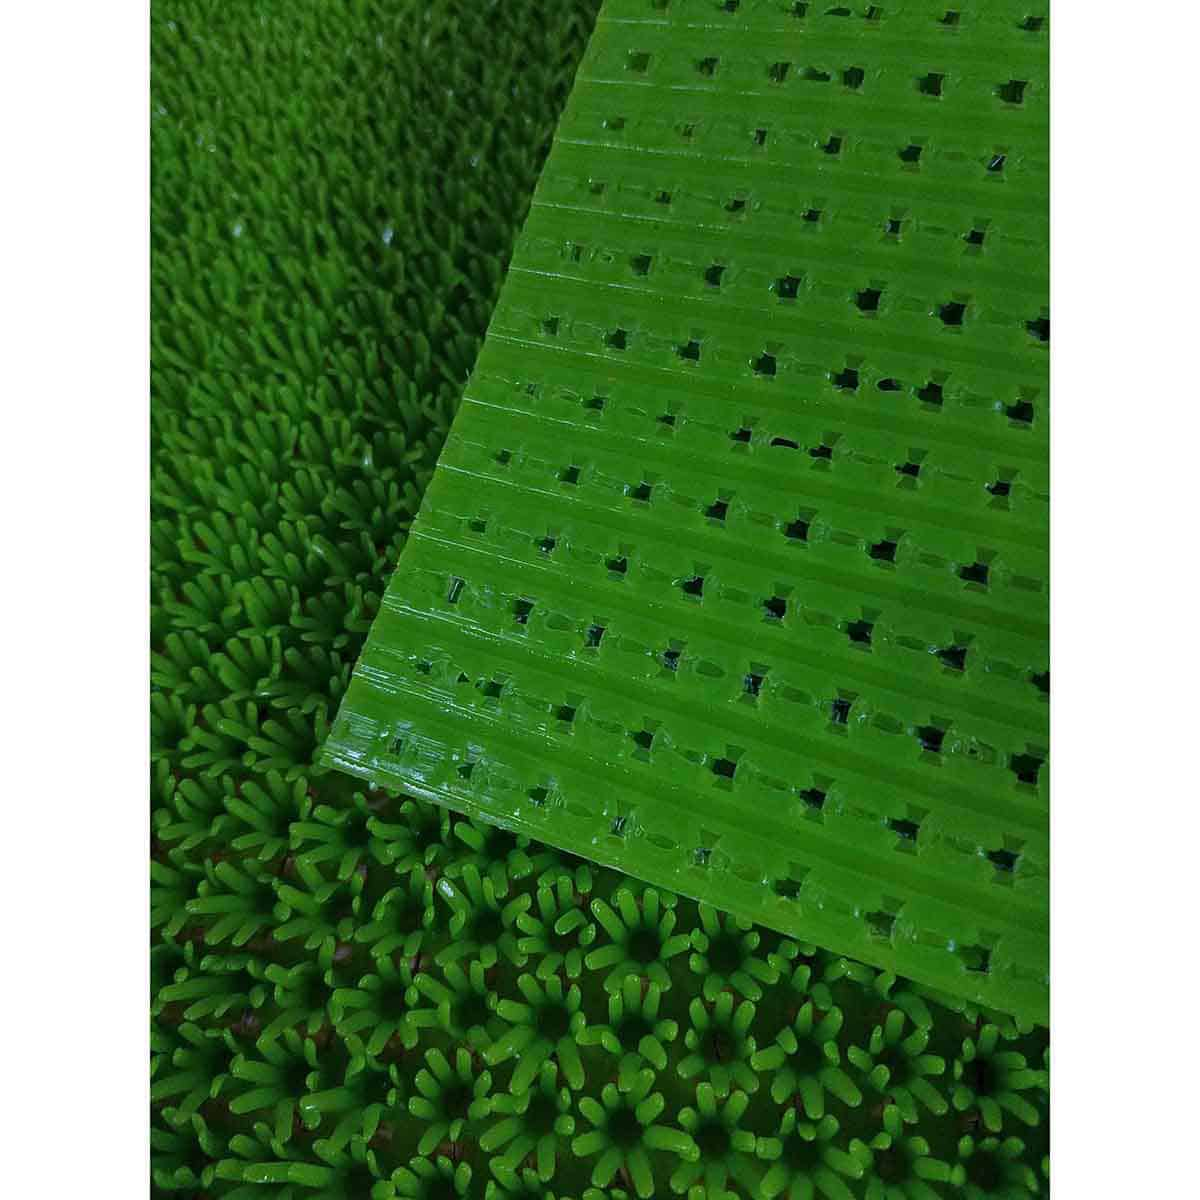 Outdoor Front Door Mat Pixie Artificial Grass Rug 24x16 Green